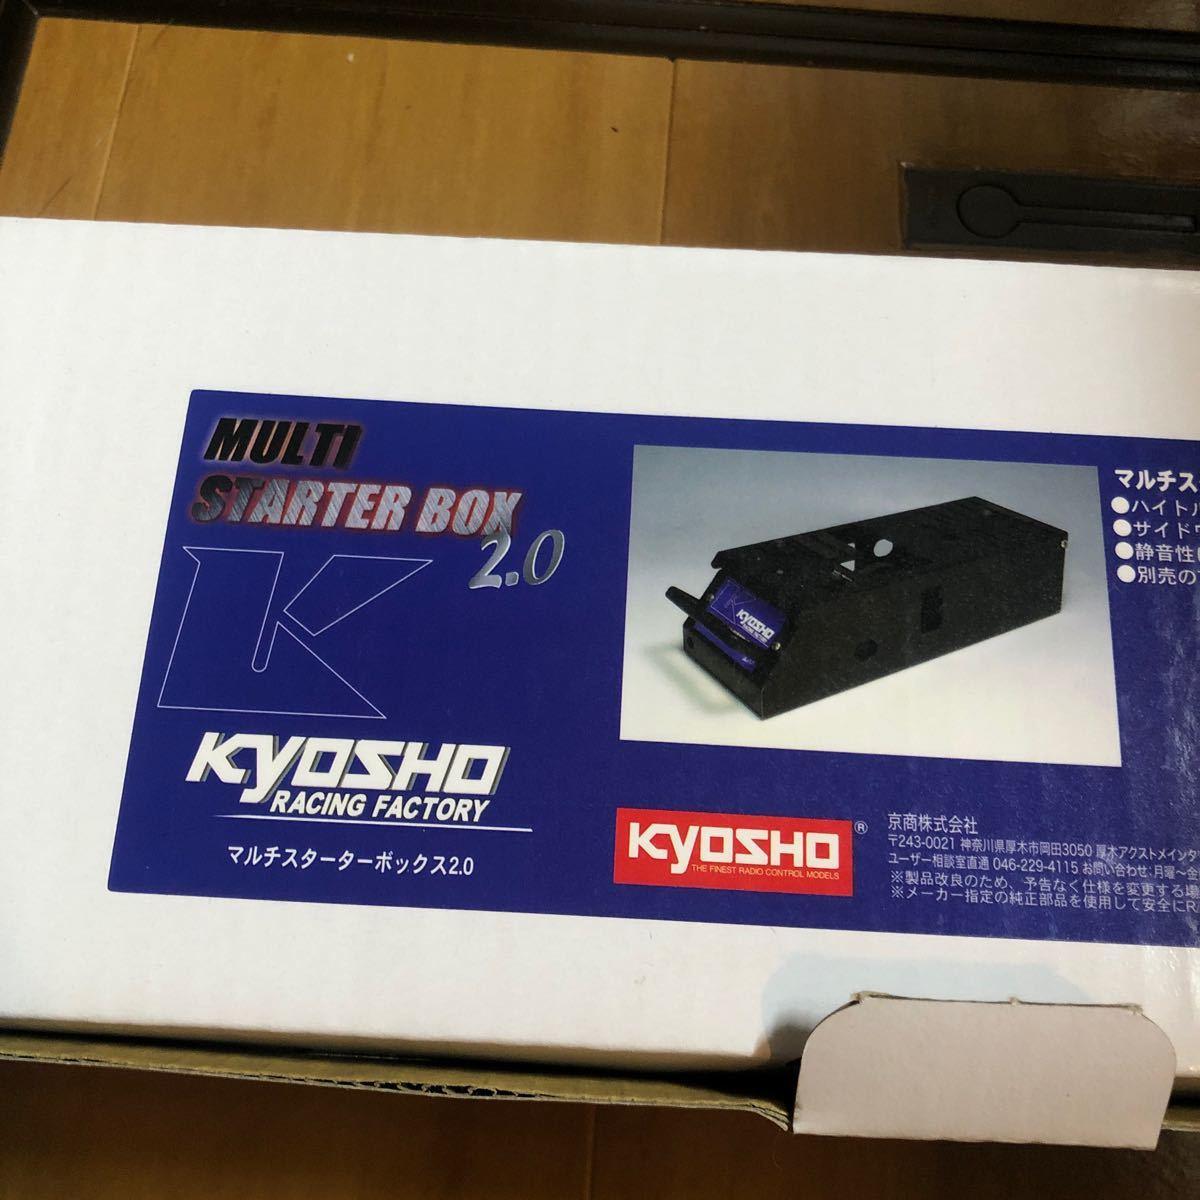 Kyosho Multi Starter Box 2.0